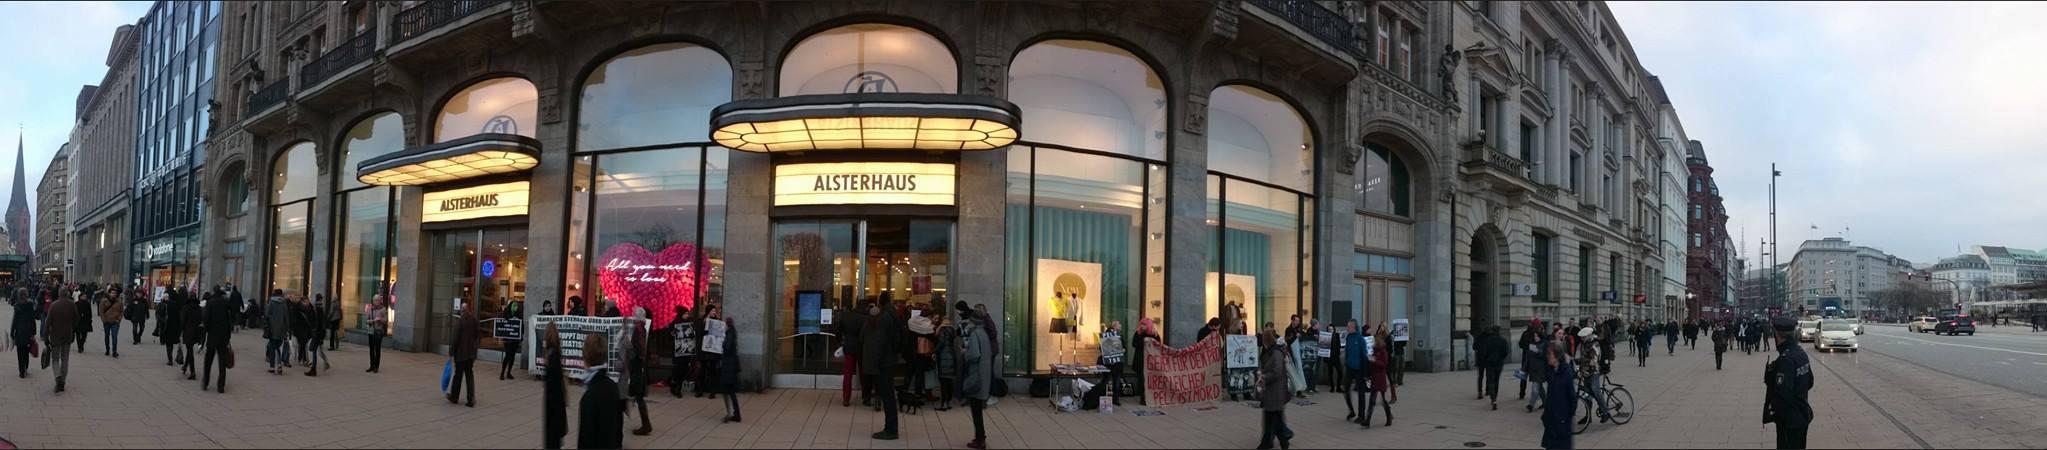 protest-alsterhaus